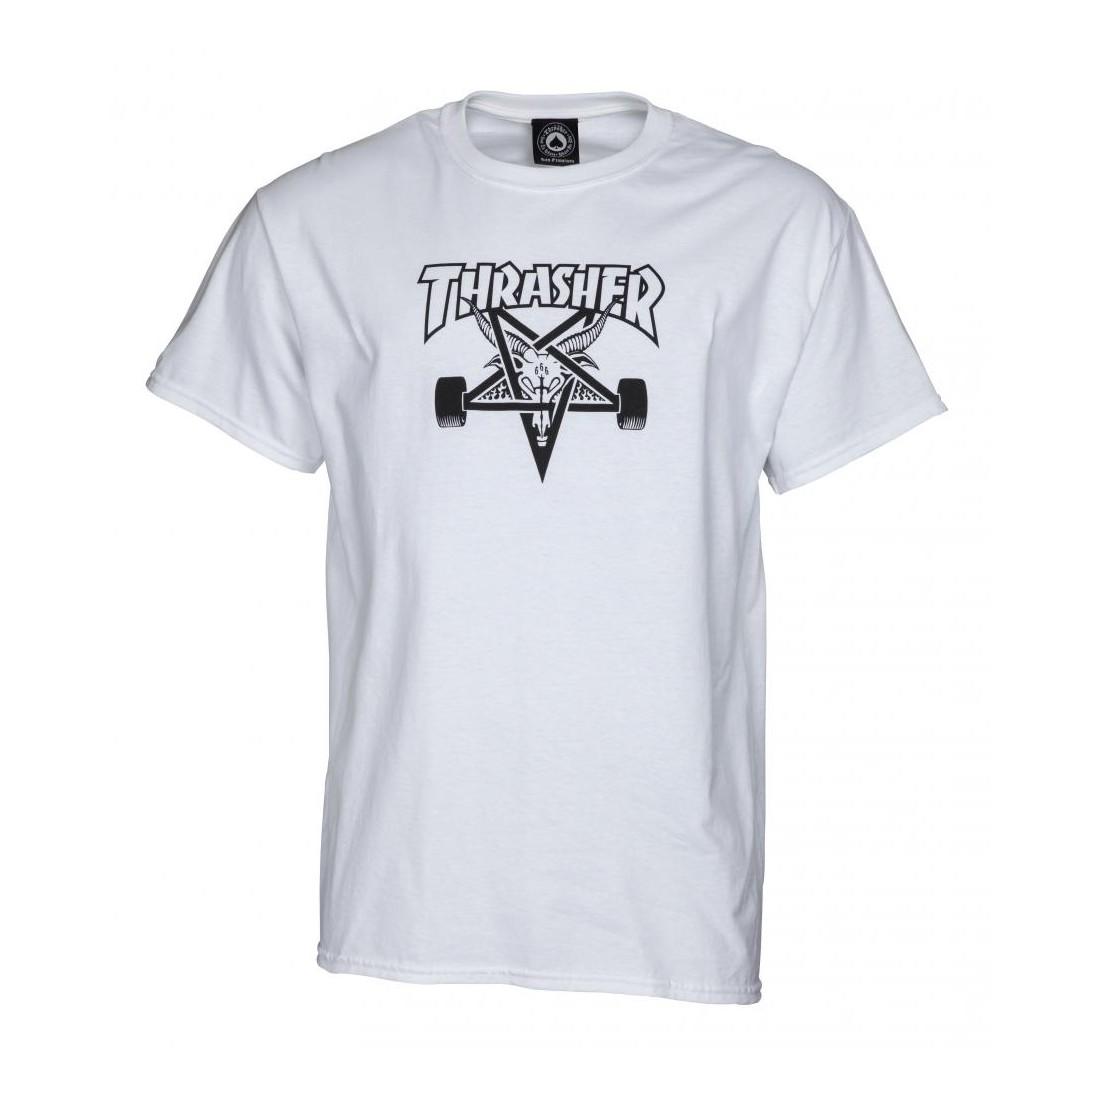 T Shirt Thrasher Skategoat white